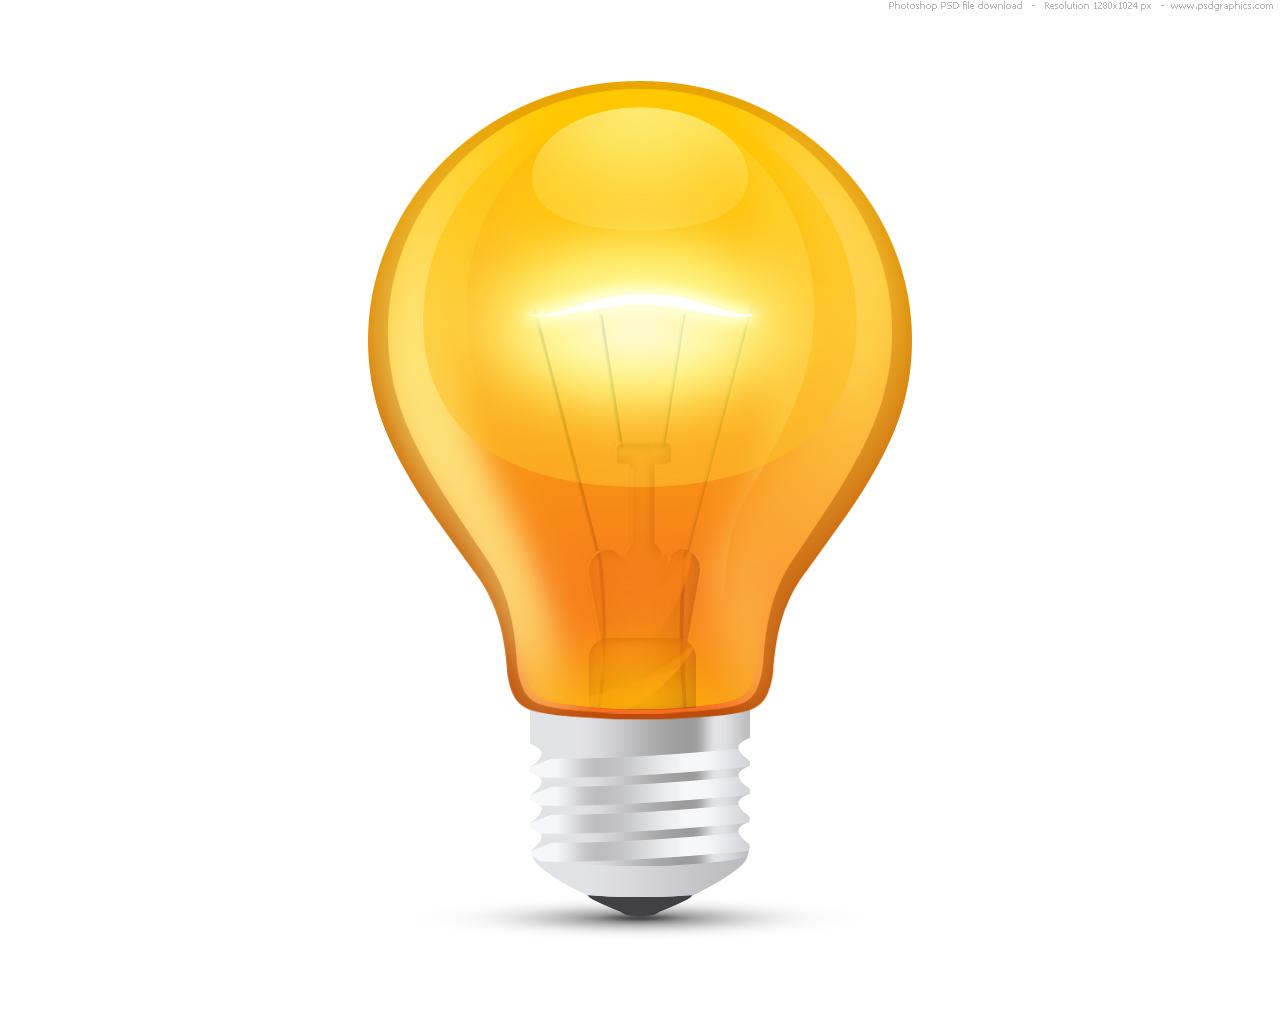 Blue Light Bulbs Sad